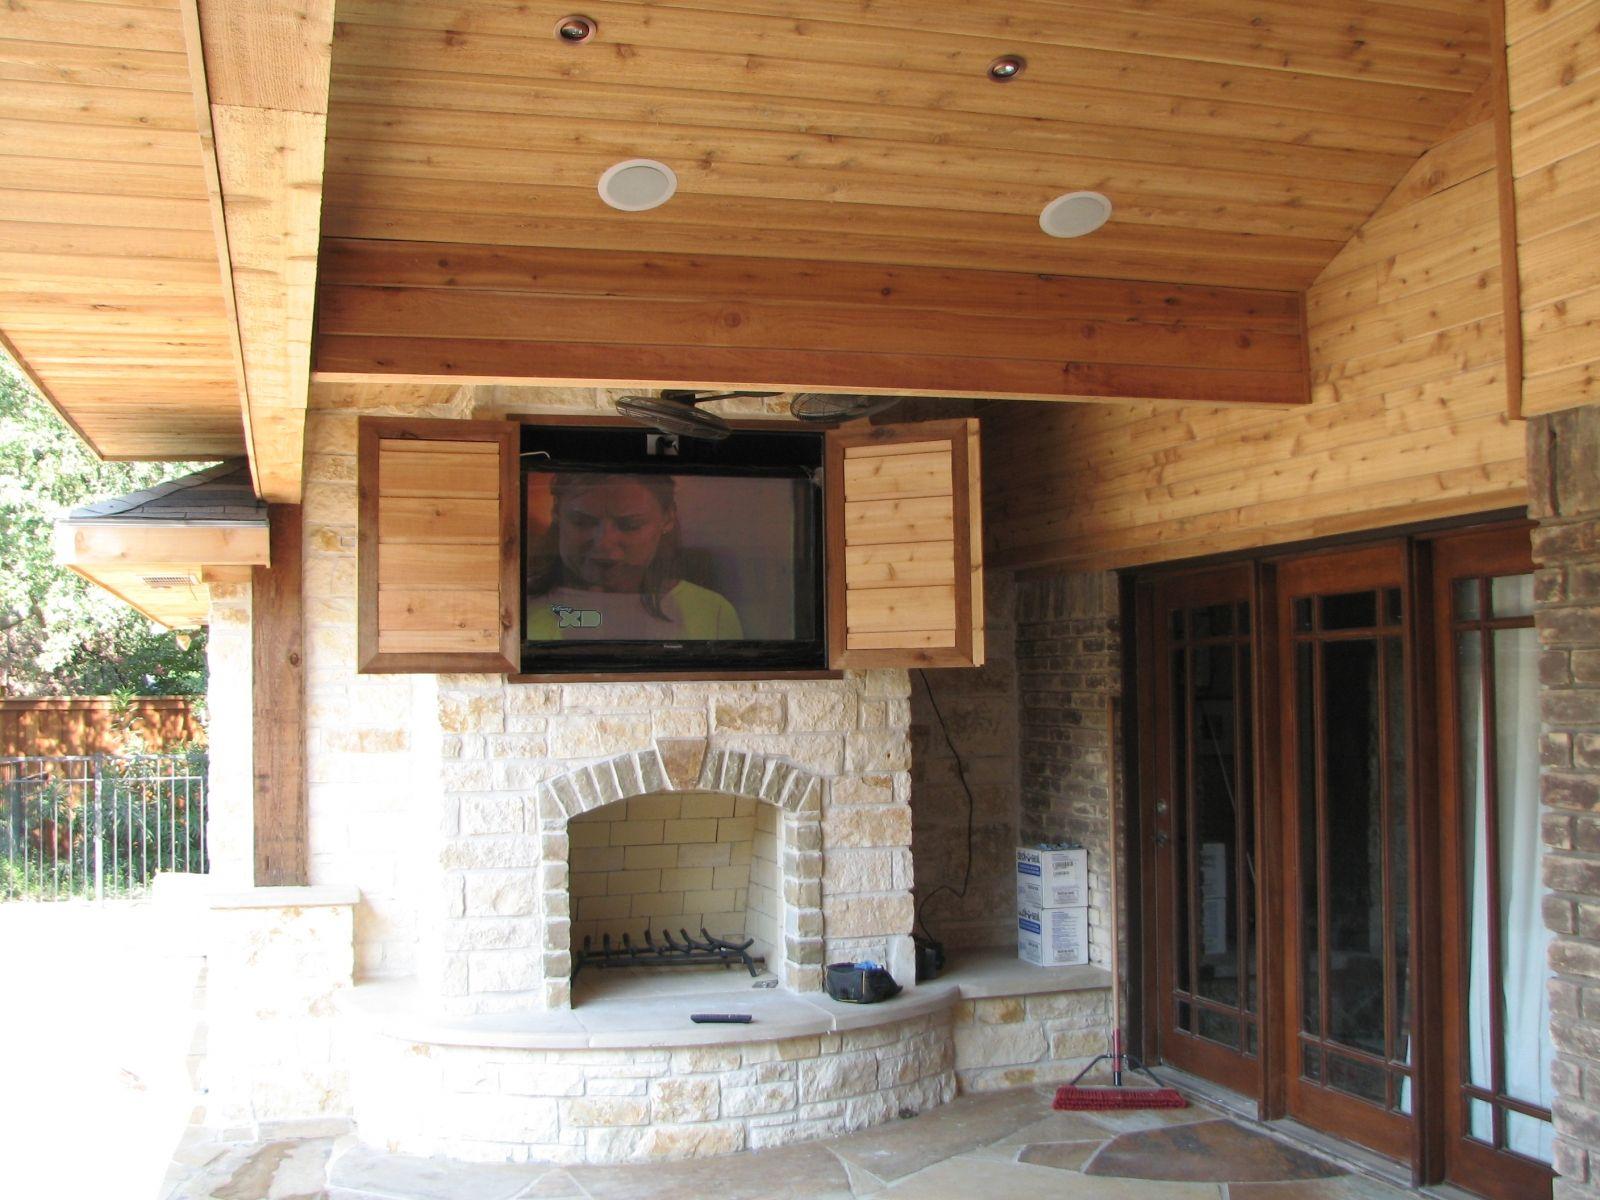 stone+fireplace+storage | Entertainment Center Ideas ...